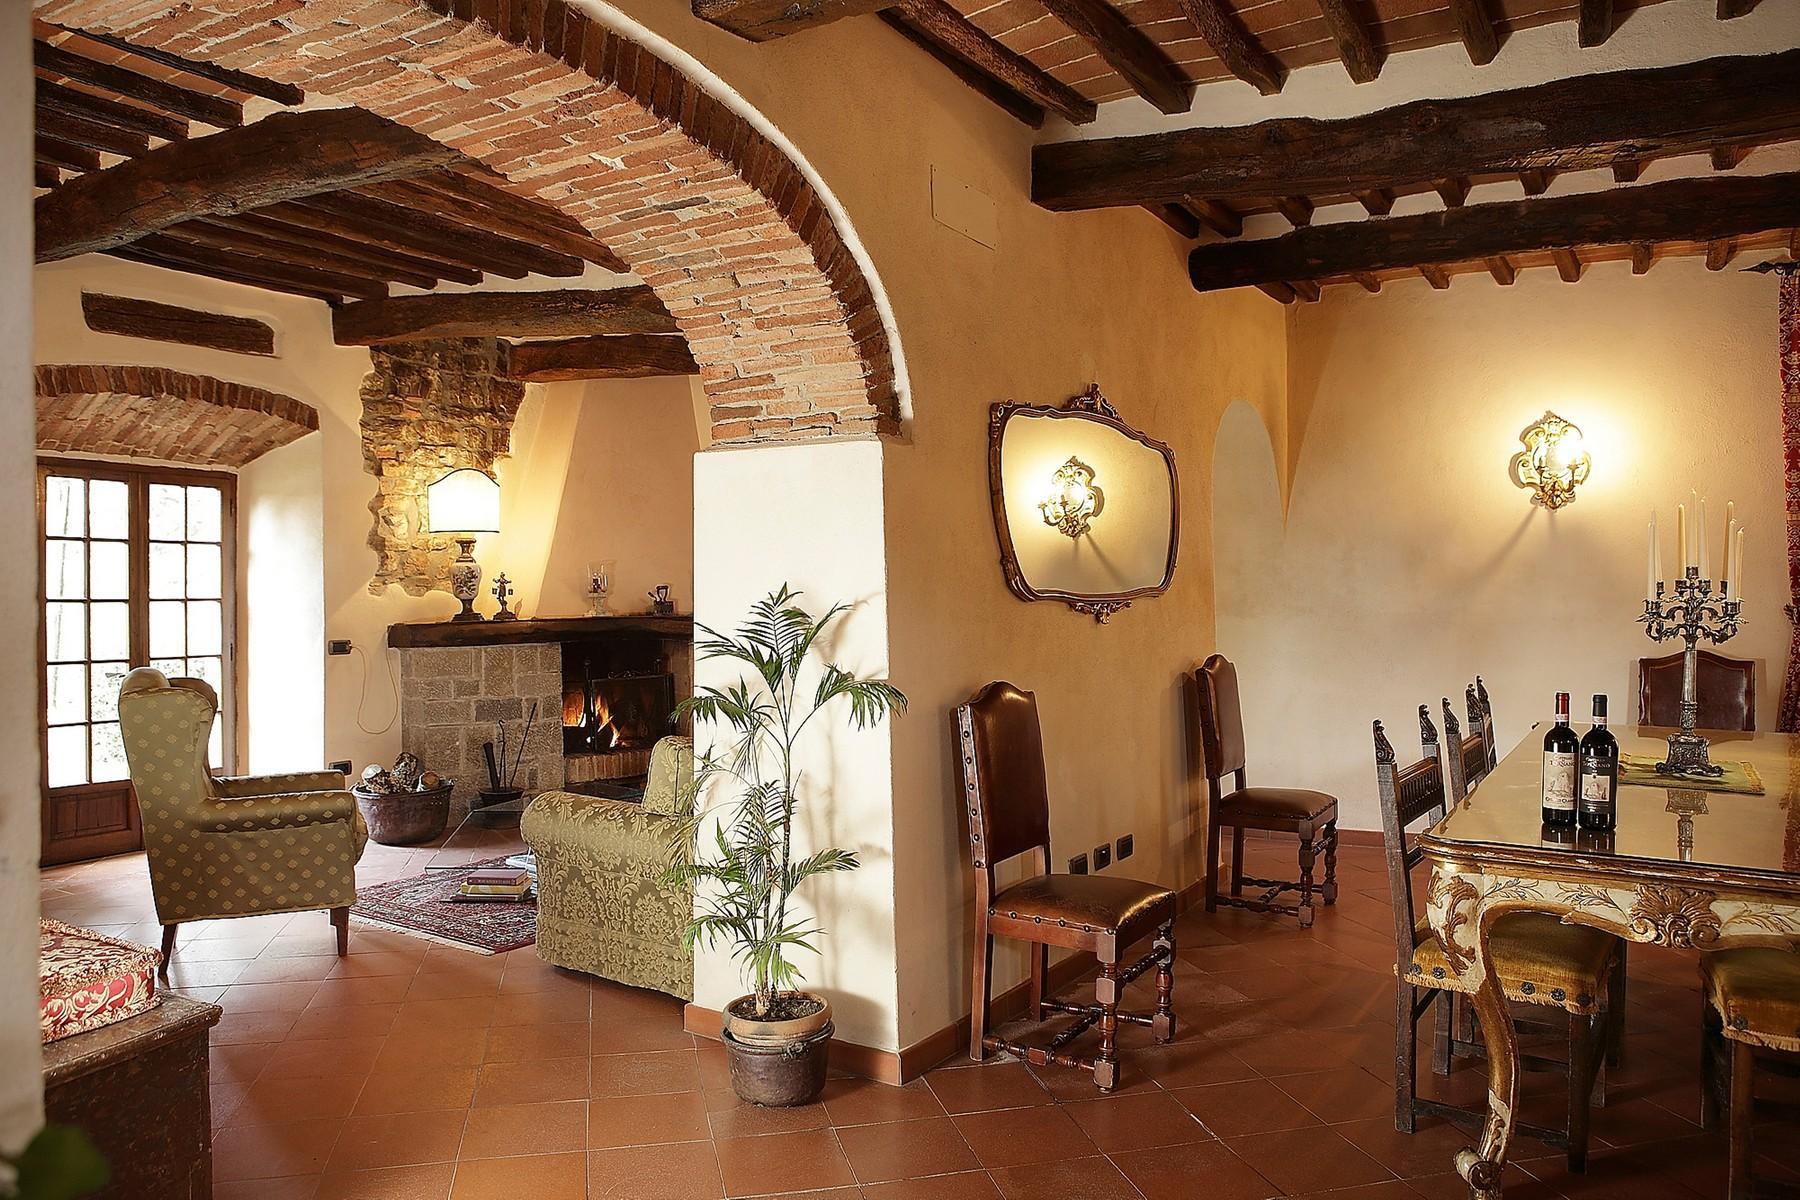 Exclusive manor in the heart of Chianti Classico - 9